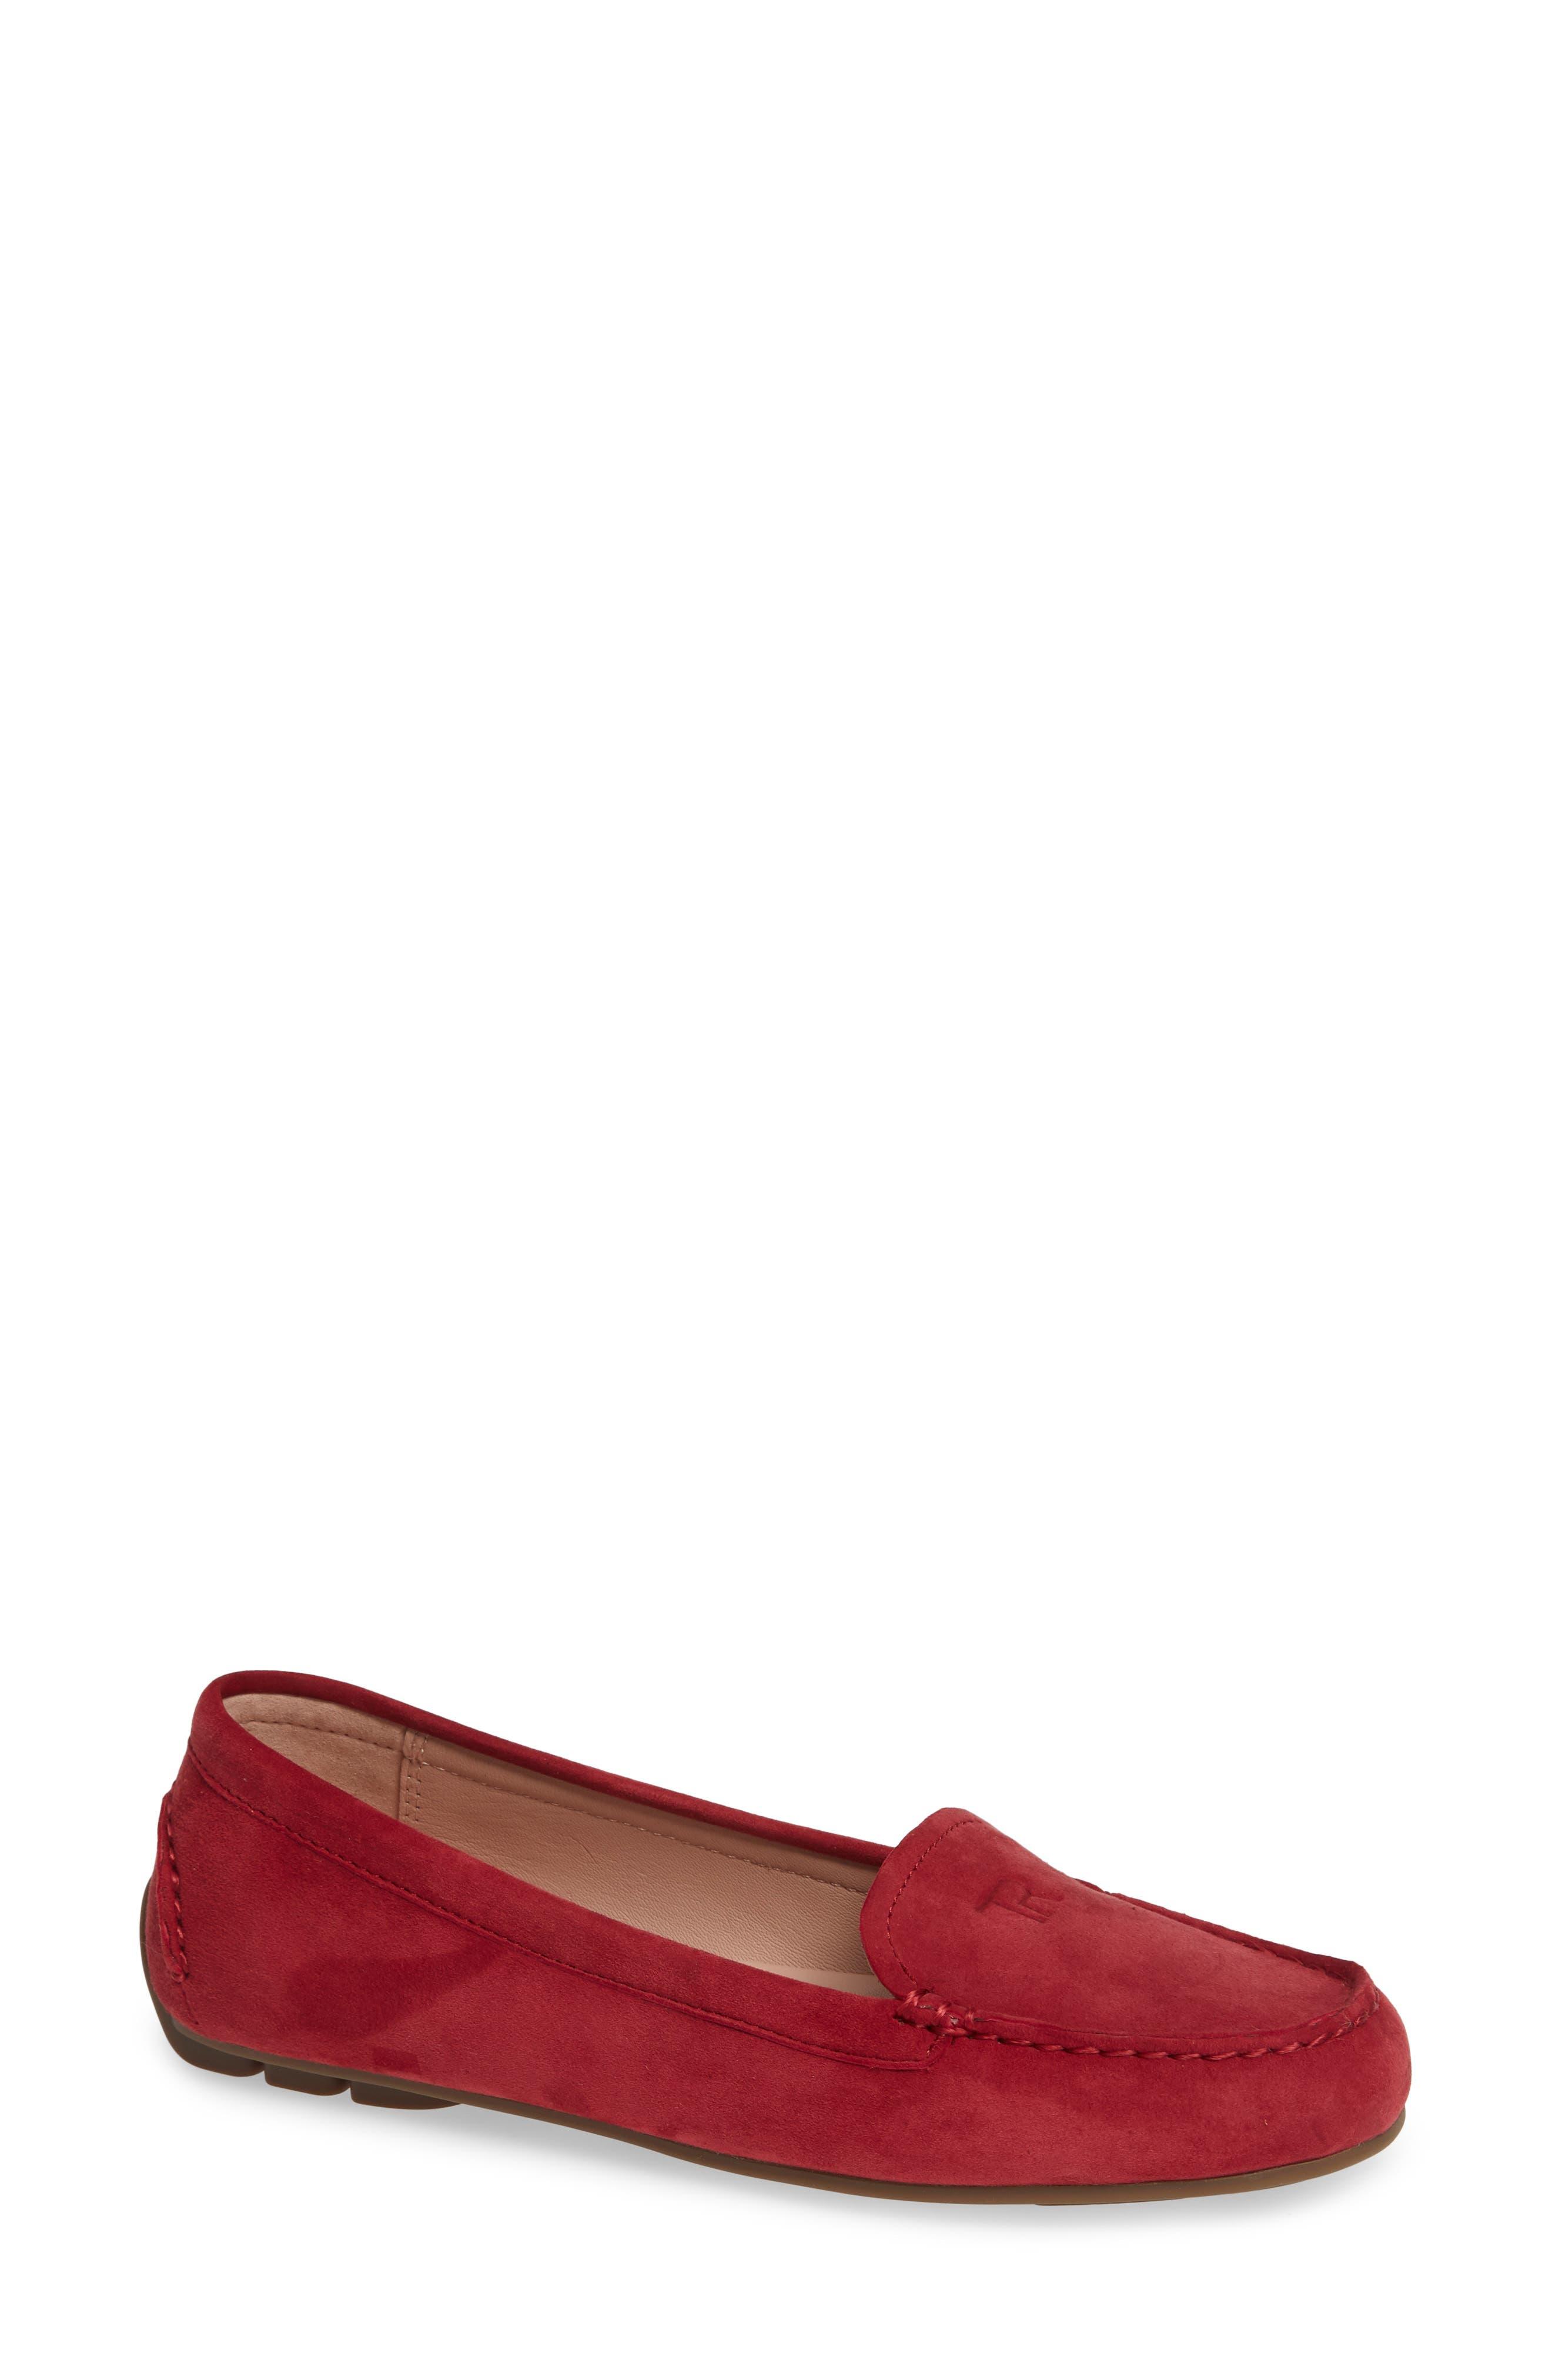 Taryn Rose Karen Water Resistant Driving Loafer, Red